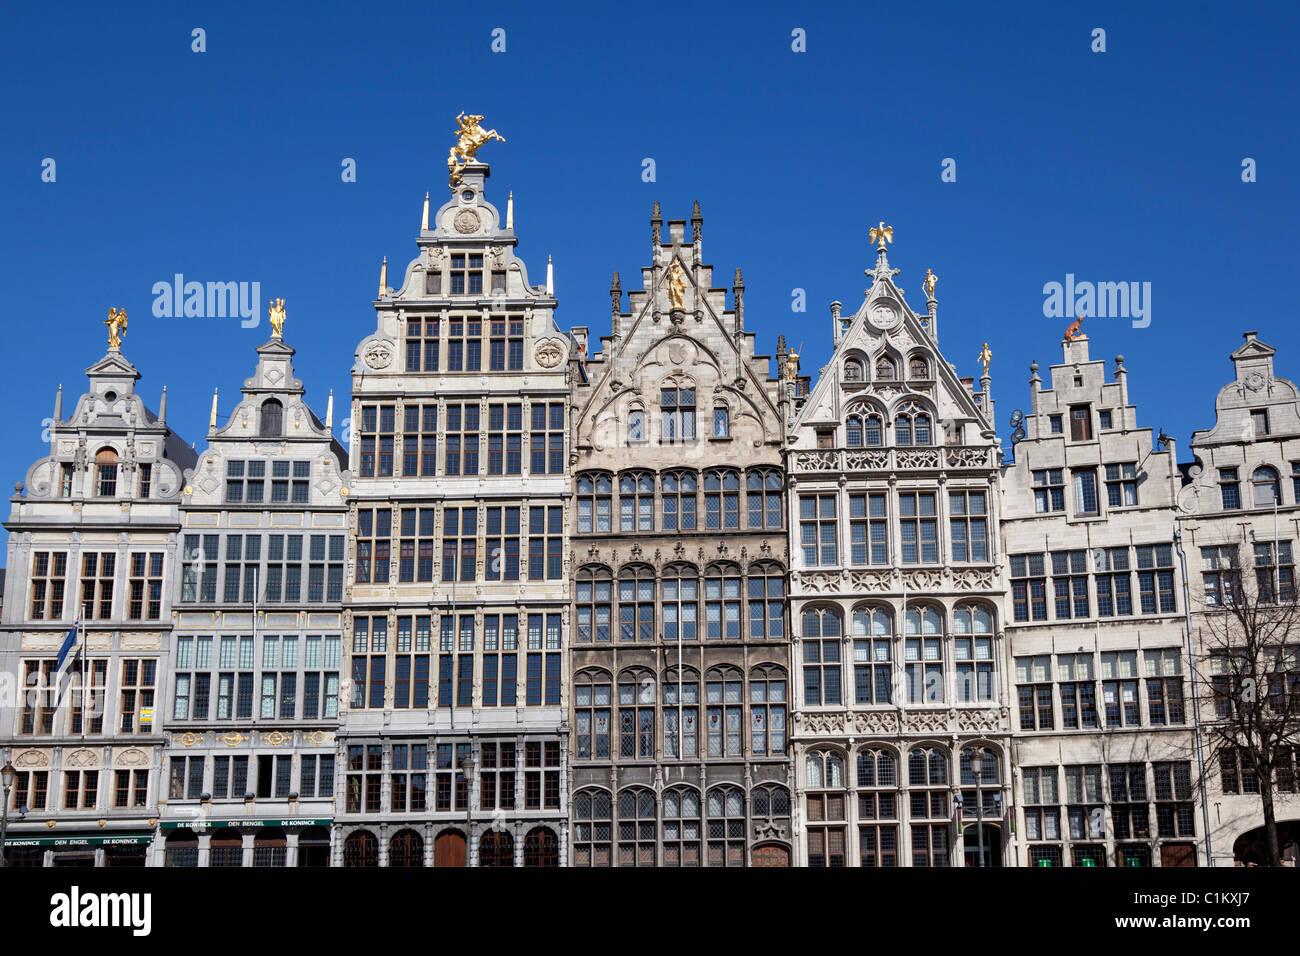 Row of Flemish houses on the Grote markt in Antwerp, Belgium - Stock Image